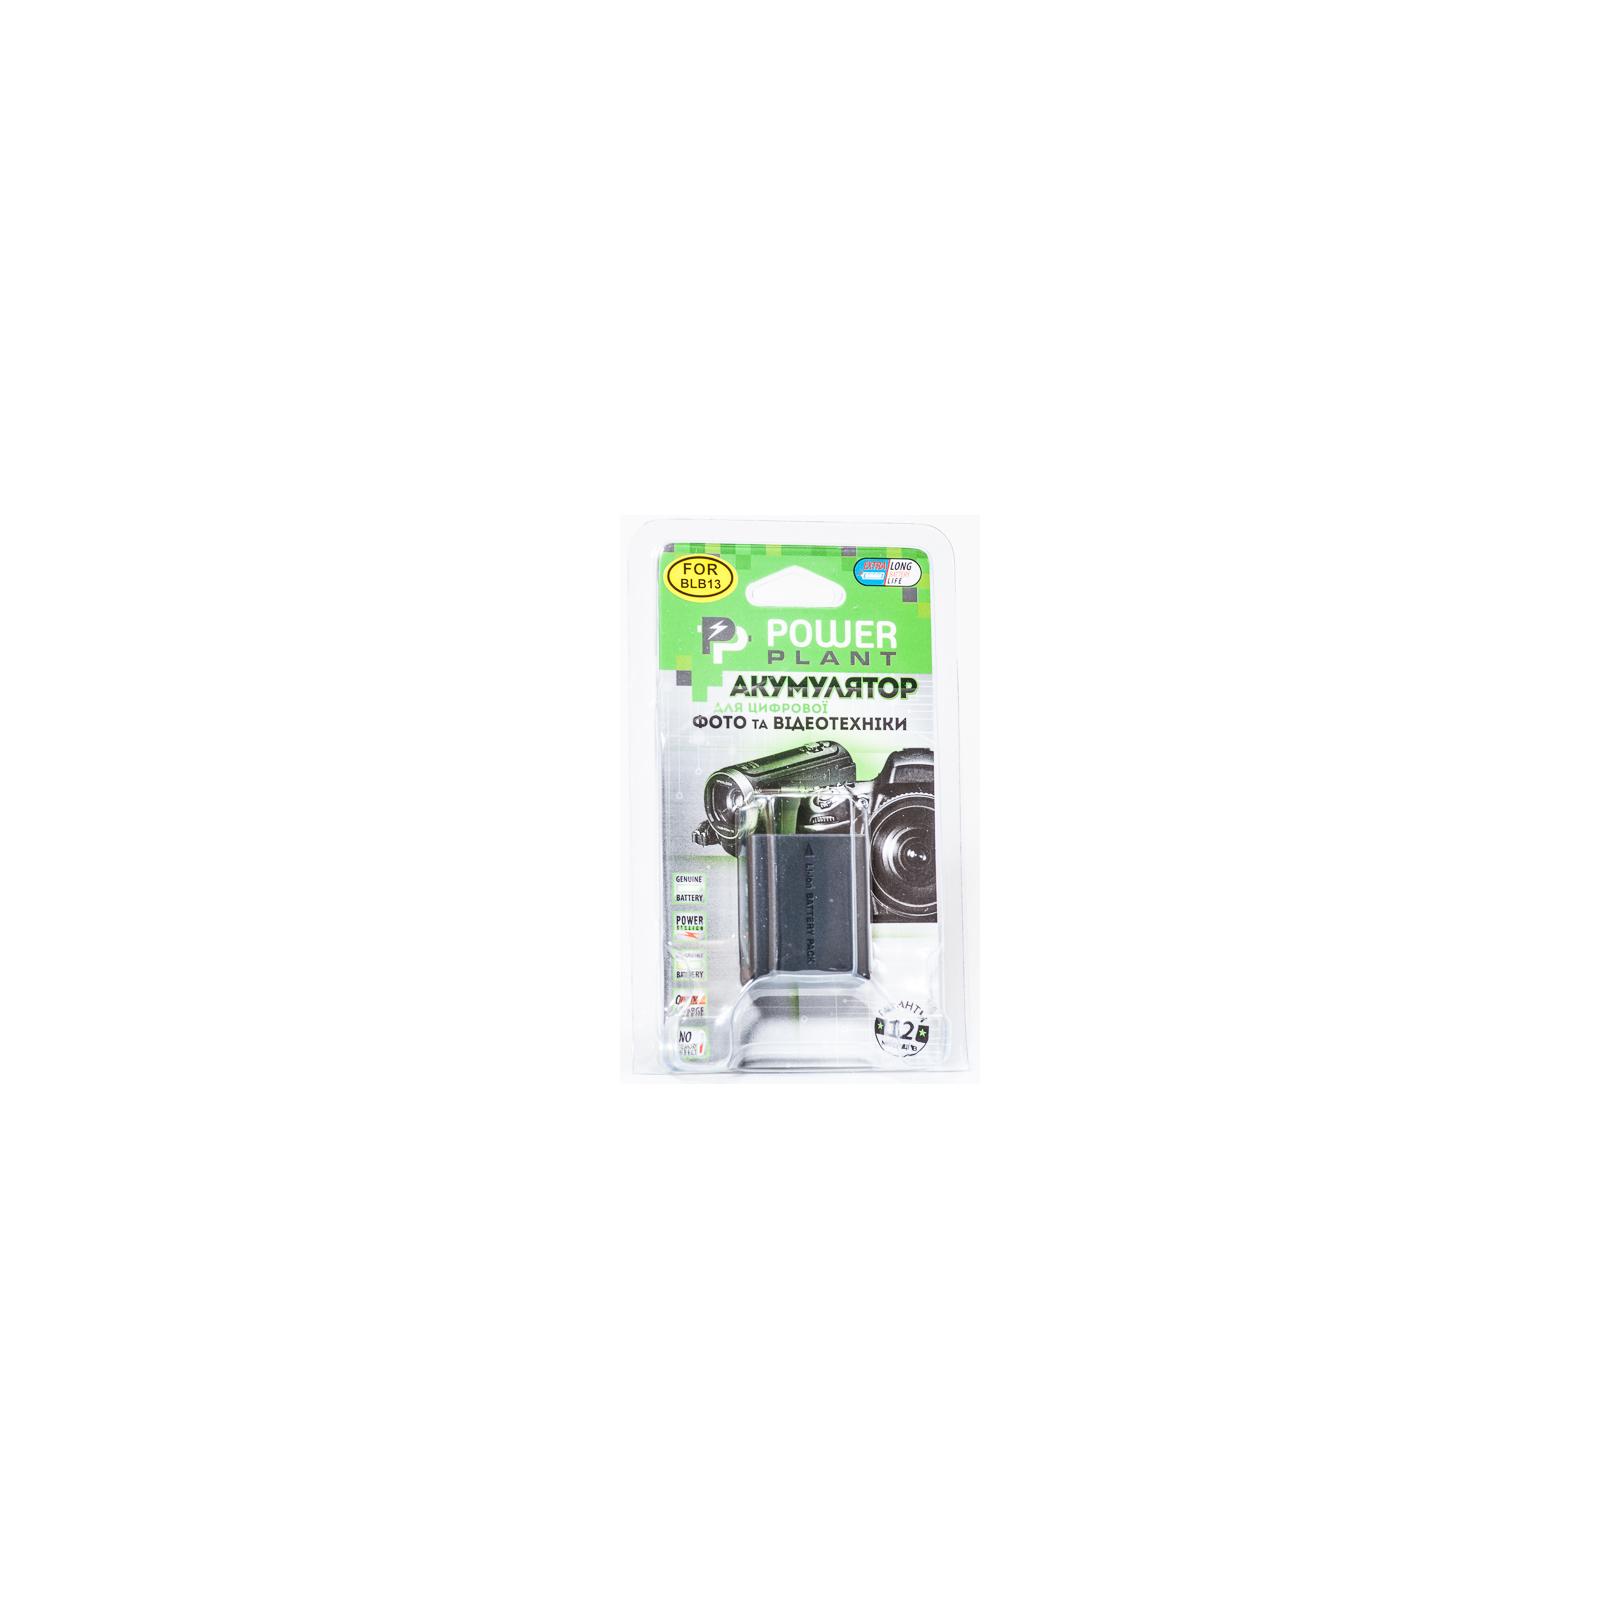 Аккумулятор к фото/видео PowerPlant Panasonic DMW-BLB13 (DV00DV1263) изображение 3